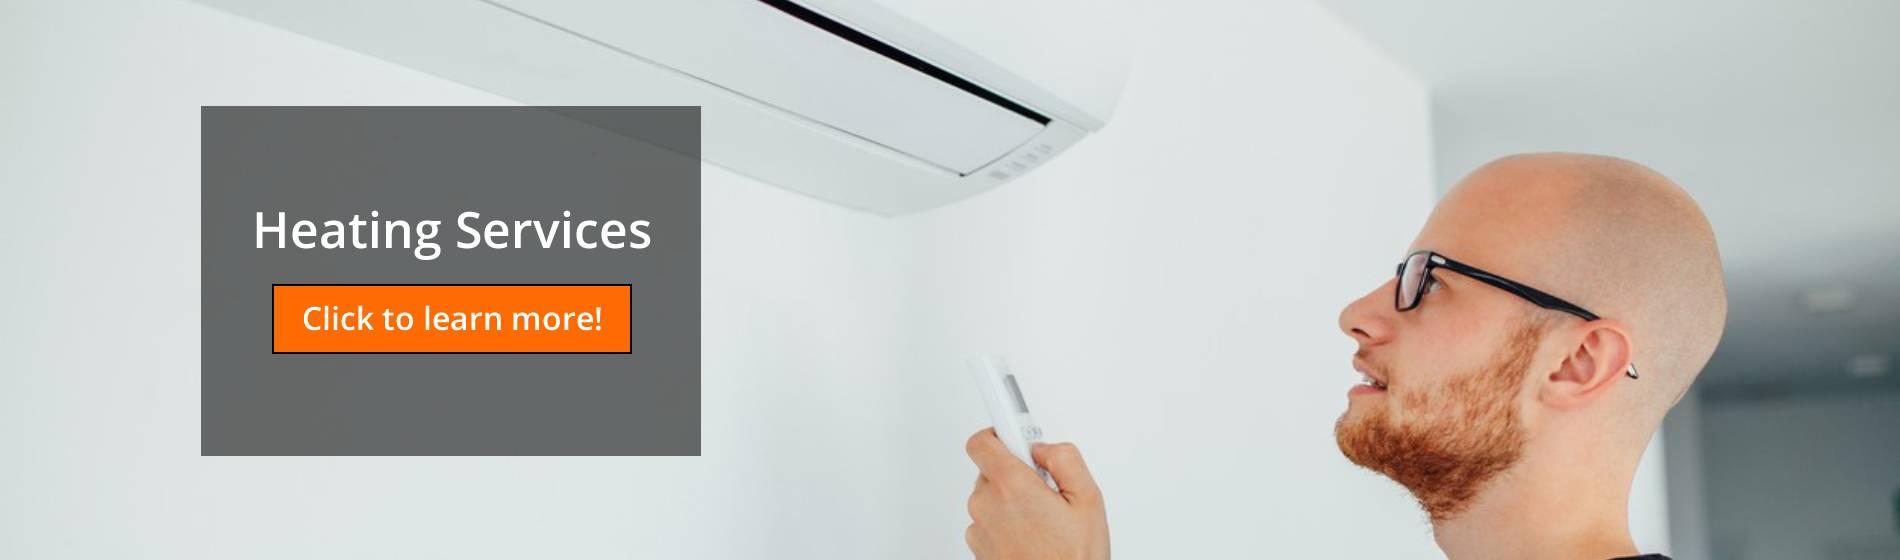 mini-split-heating-company-bay-area